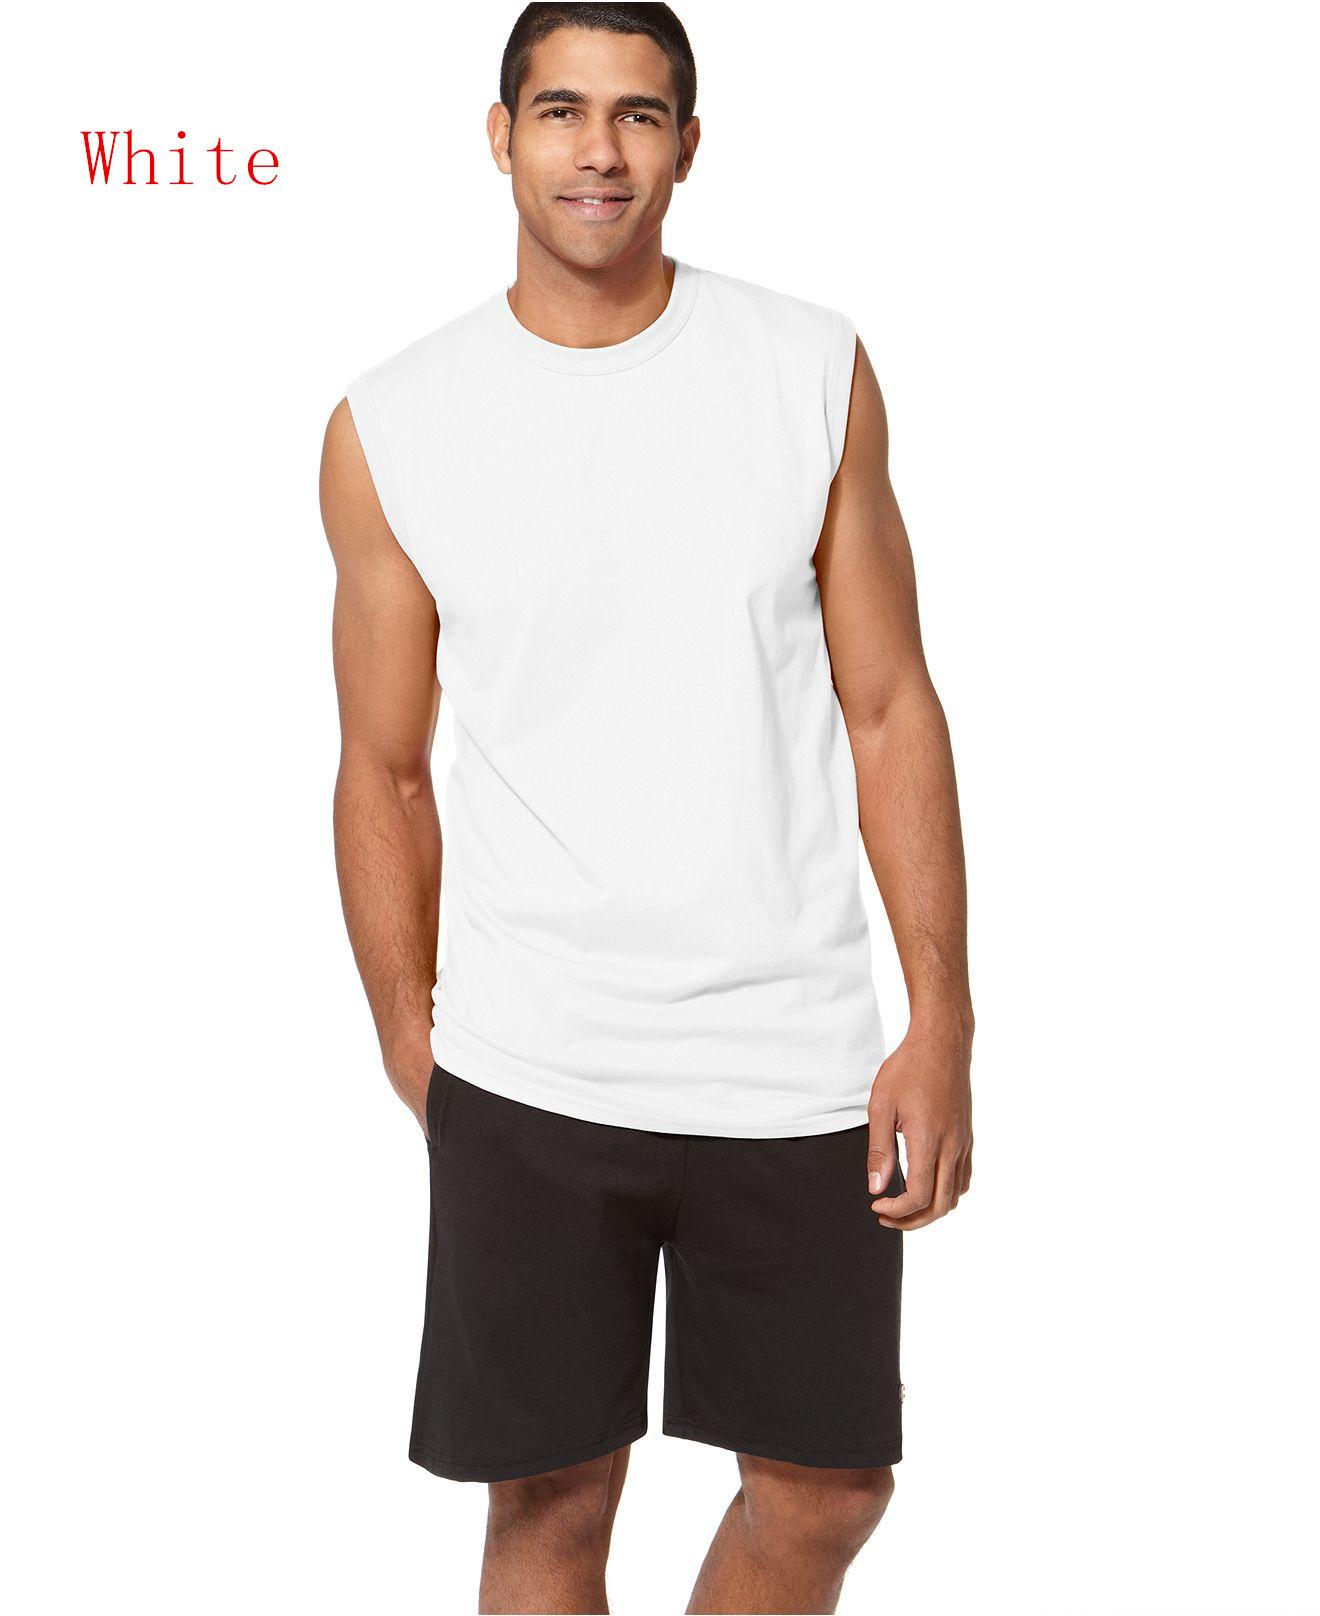 Men dri fit sleeveless blank t shirt view men sleeveless for Dri fit t shirts manufacturer